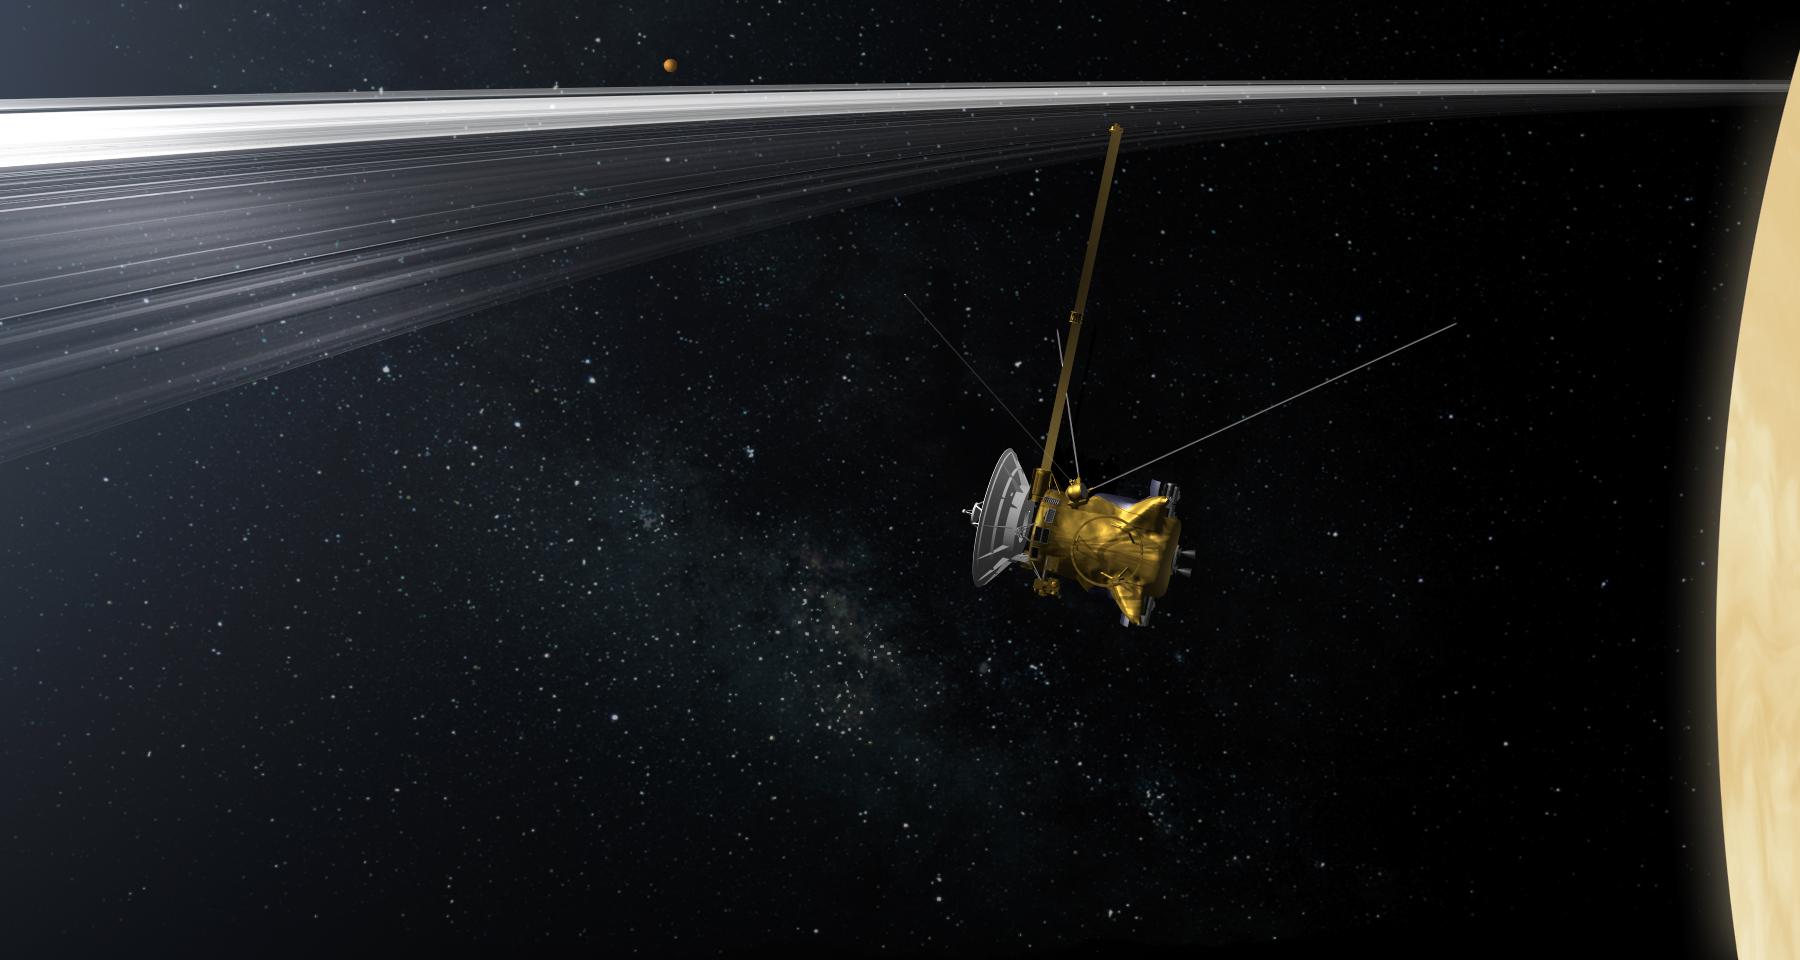 cassini orbiter cool picture - HD1280×782